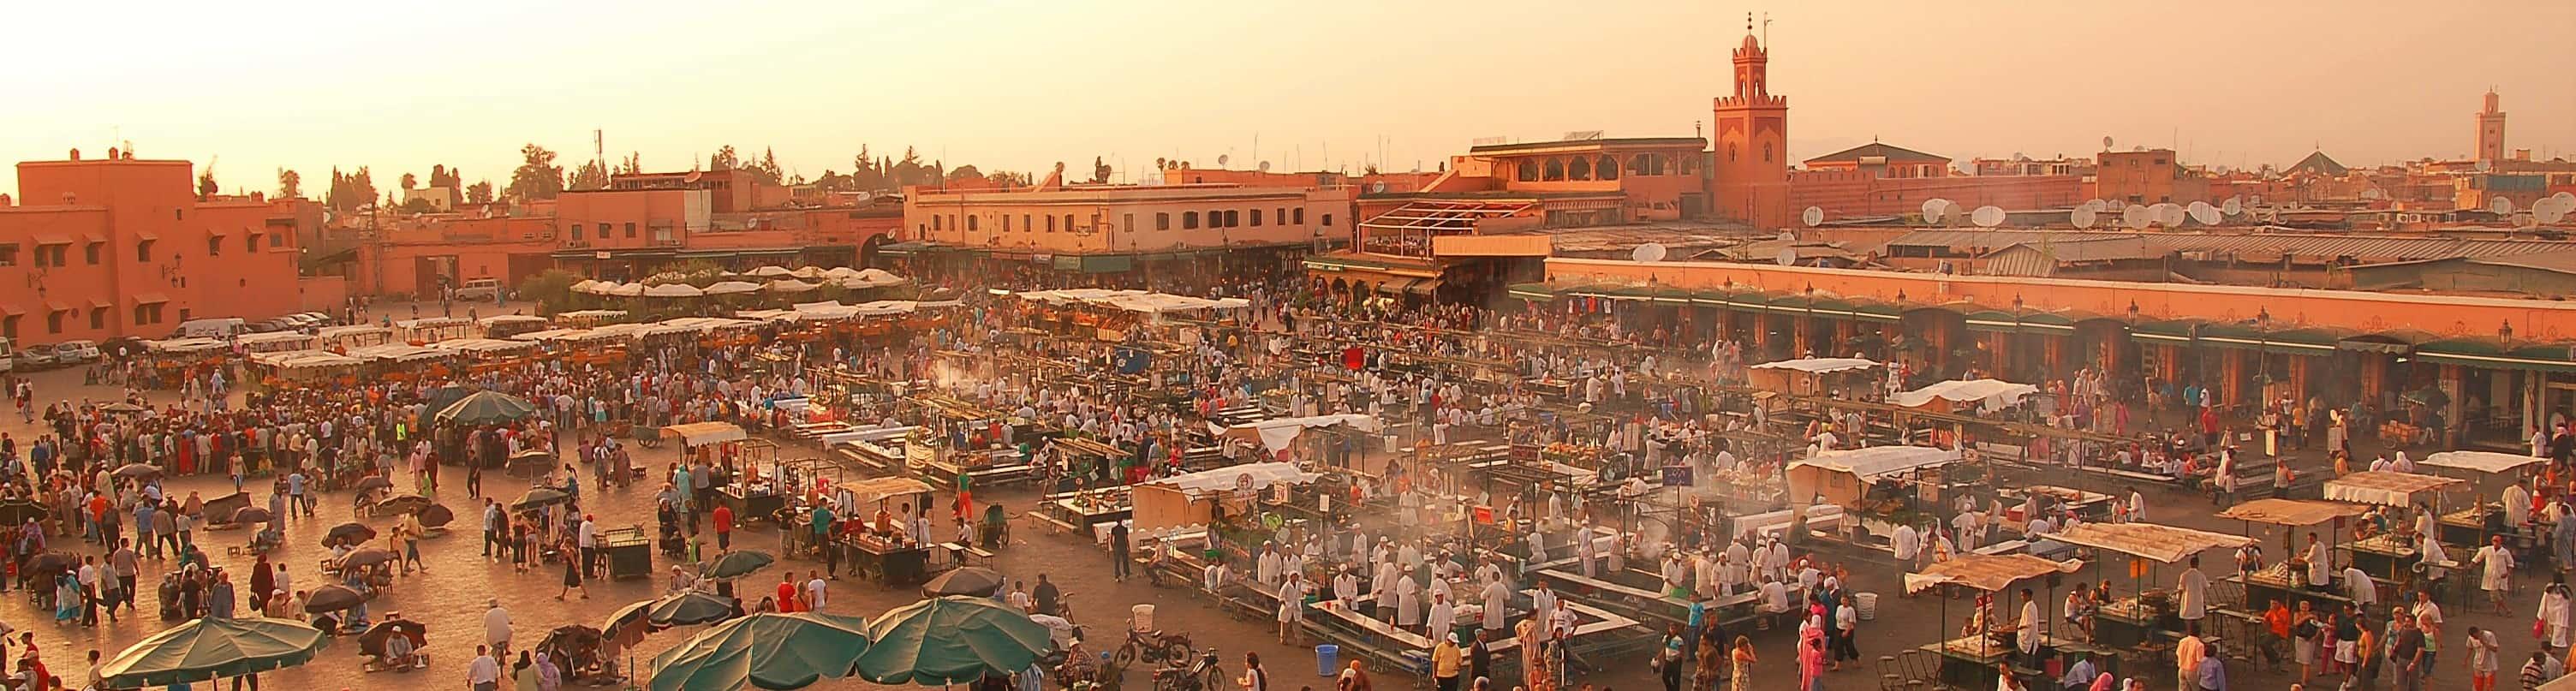 Marrakech-Desert-Tours-Morocco-Vacation-Tour